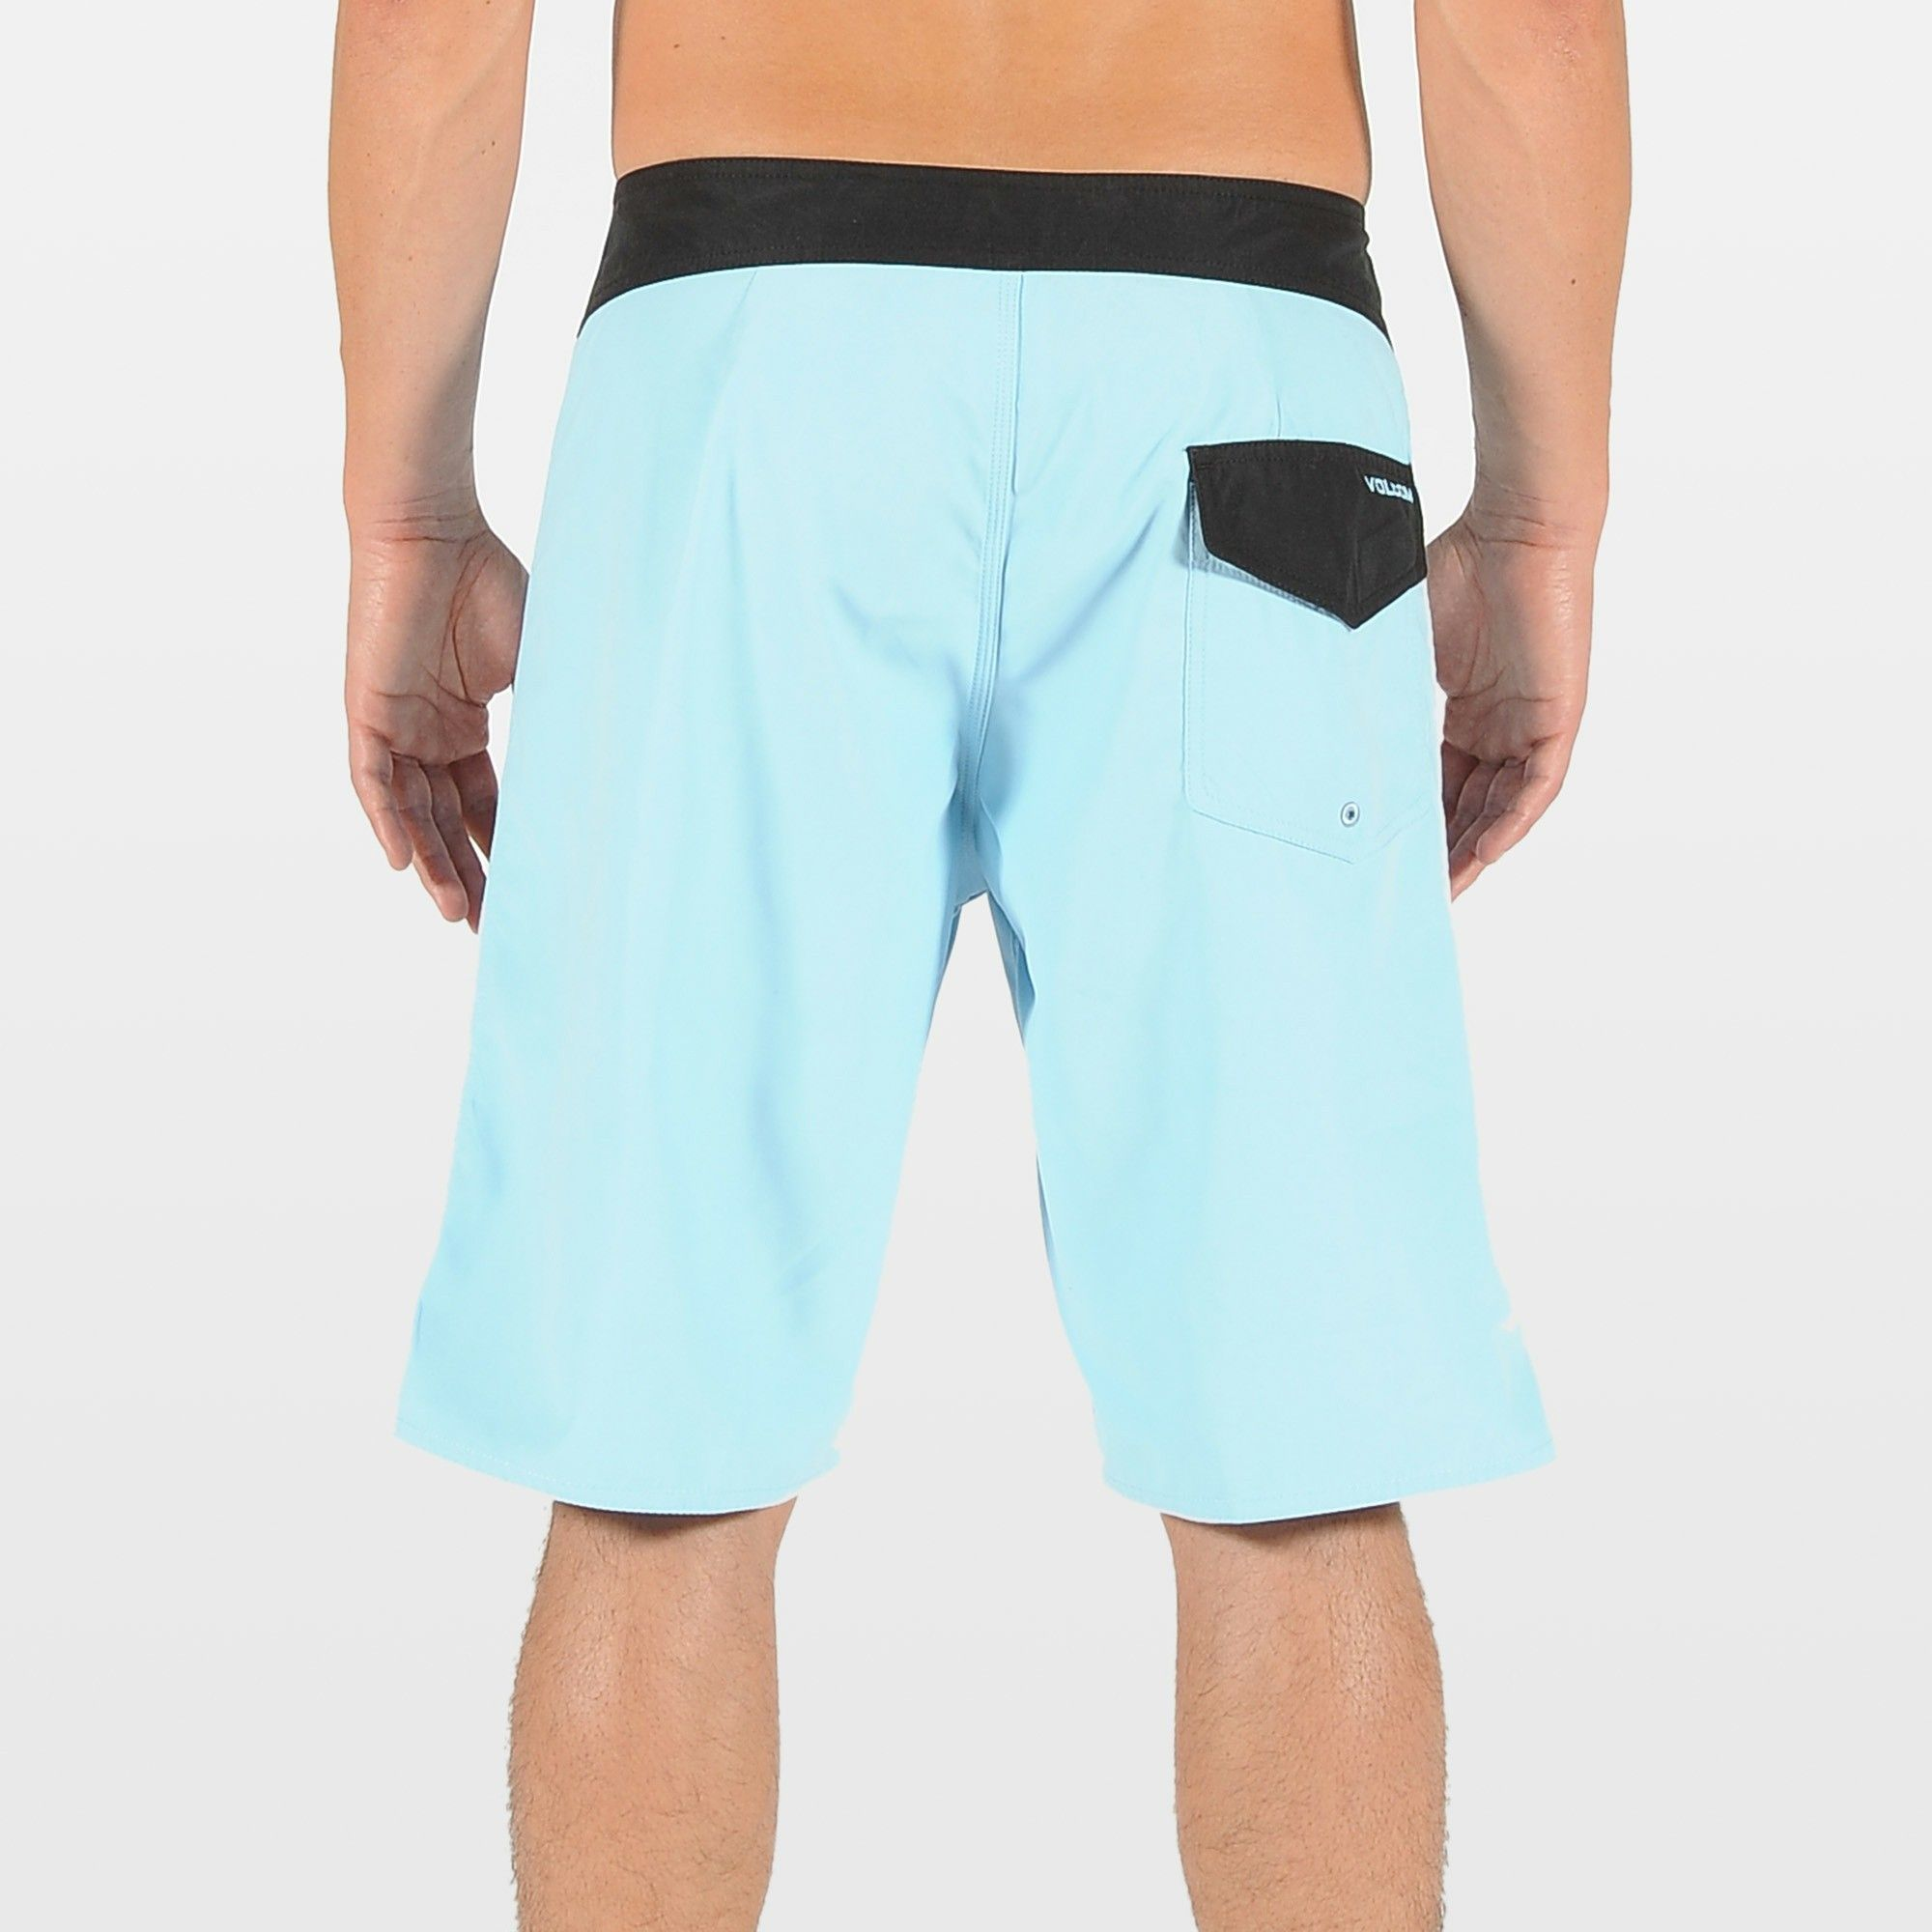 38th St Boardshorts - Boardshorts - Clothing - Men